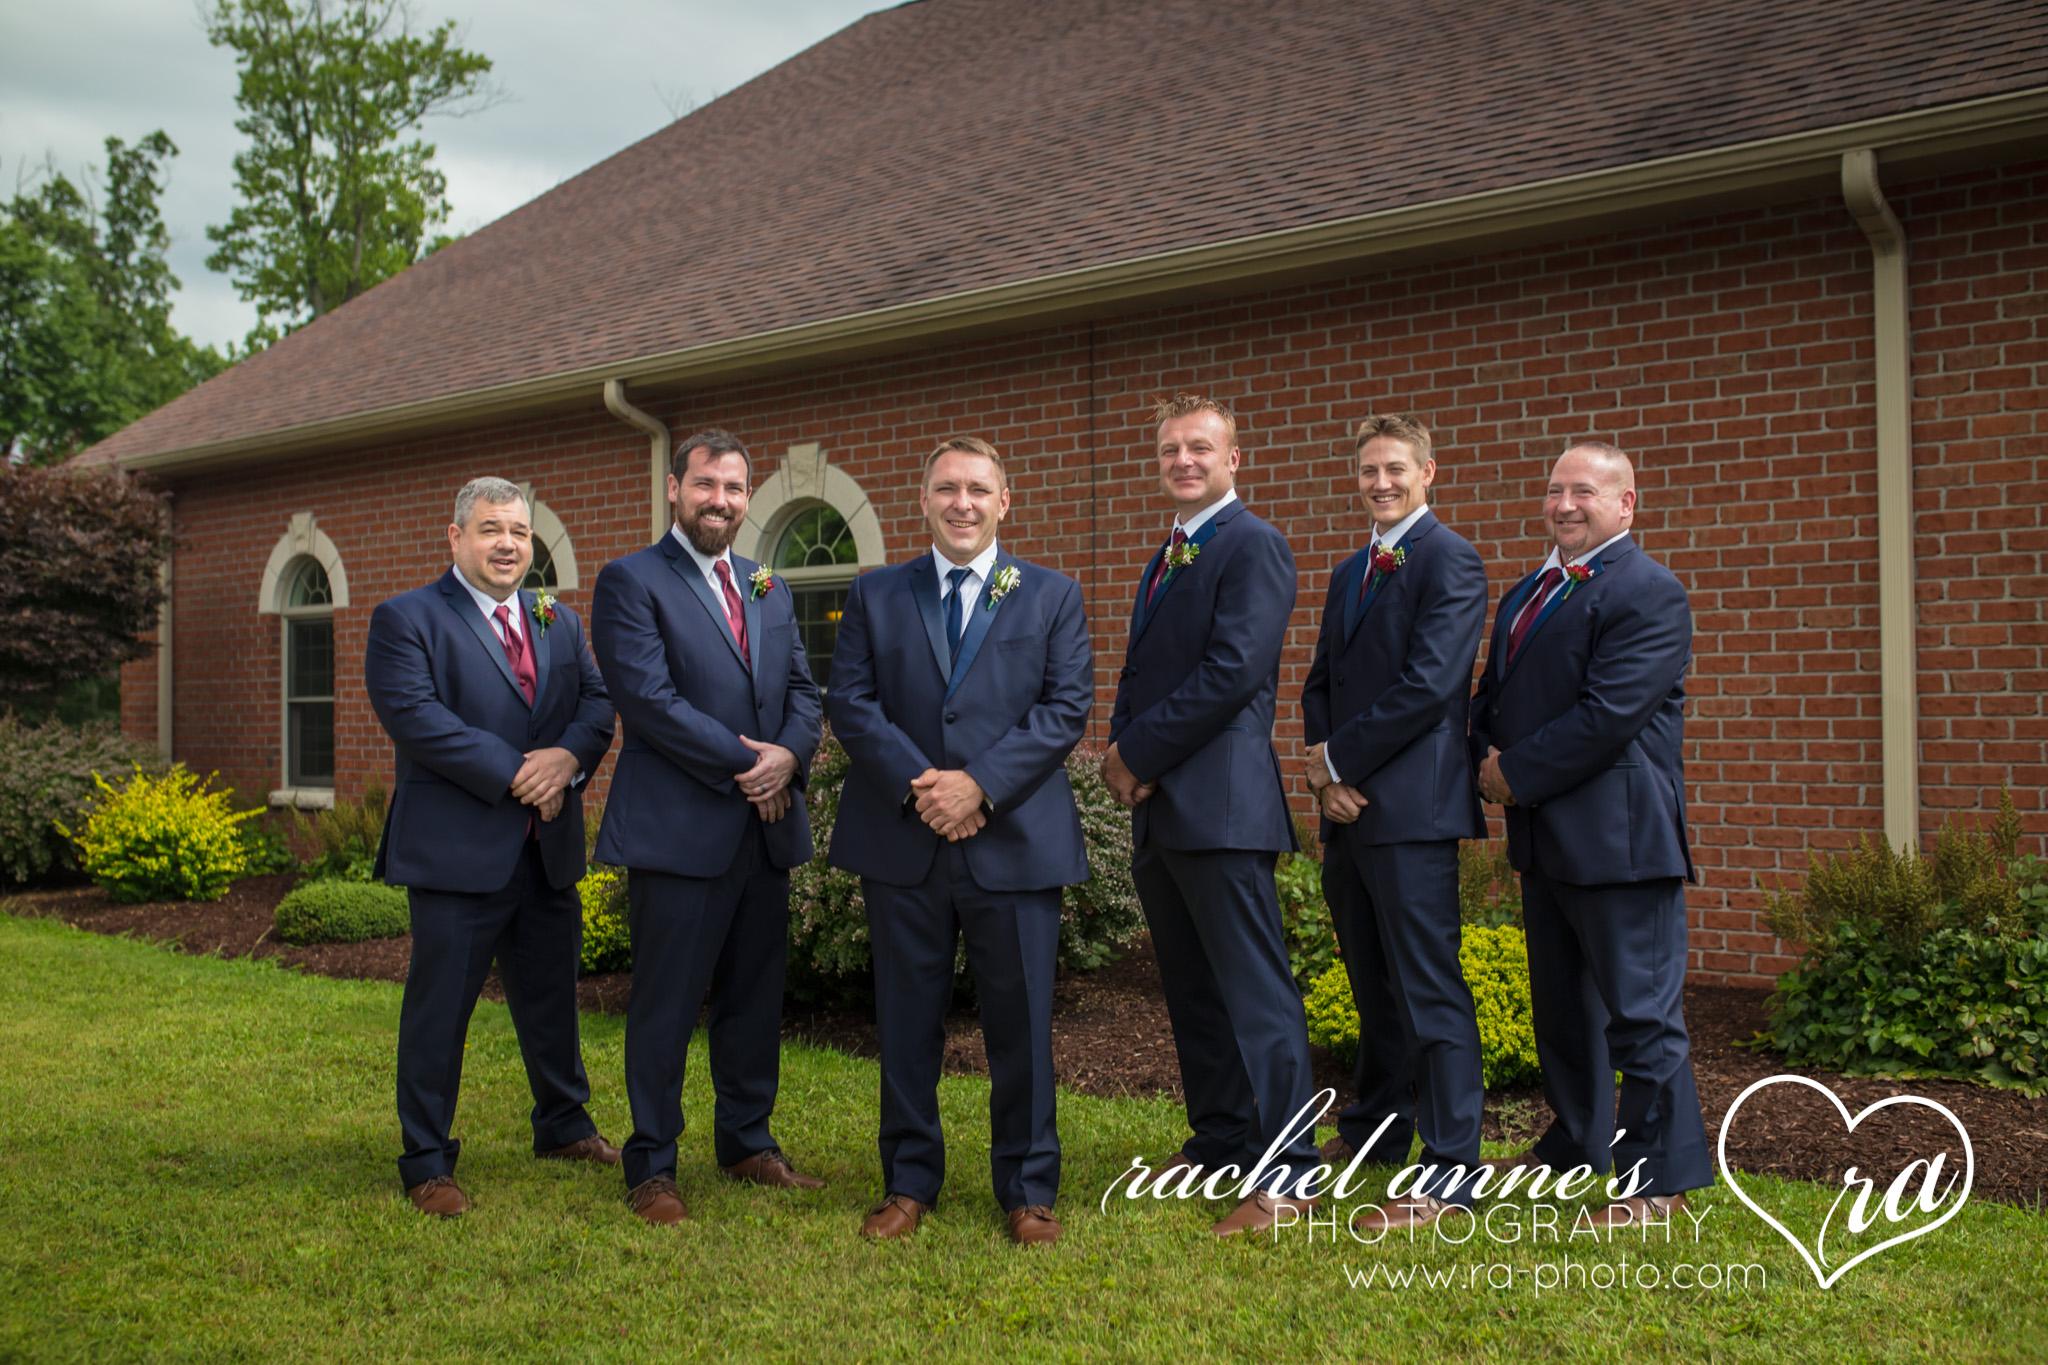 016-MAB-TREASURE-LAKE-CHURCH-LODGE-PA-WEDDINGS.jpg